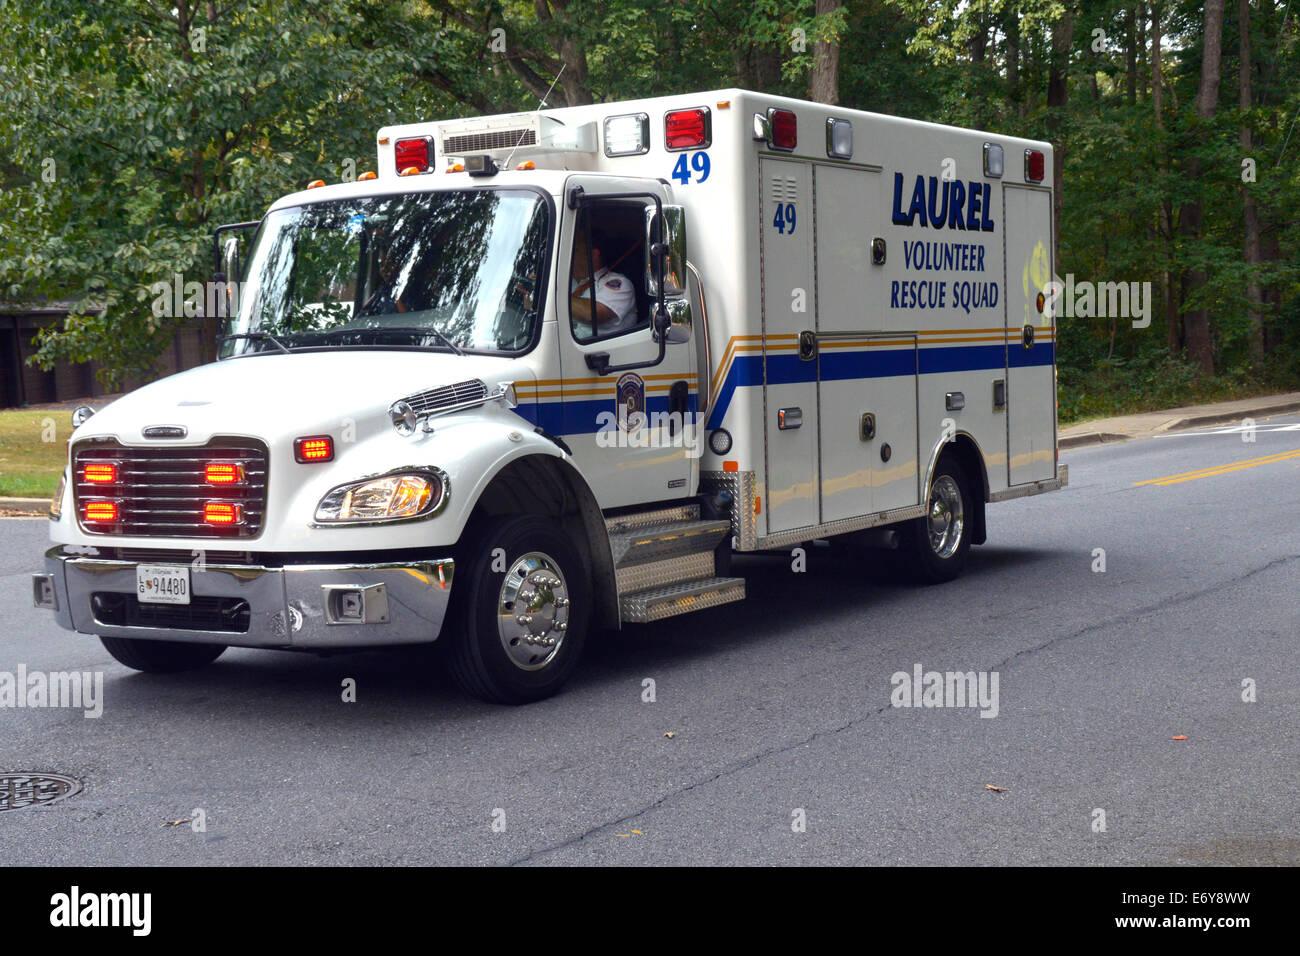 Laurel ehrenamtlich Rescie Squad Krankenwagen Stockbild